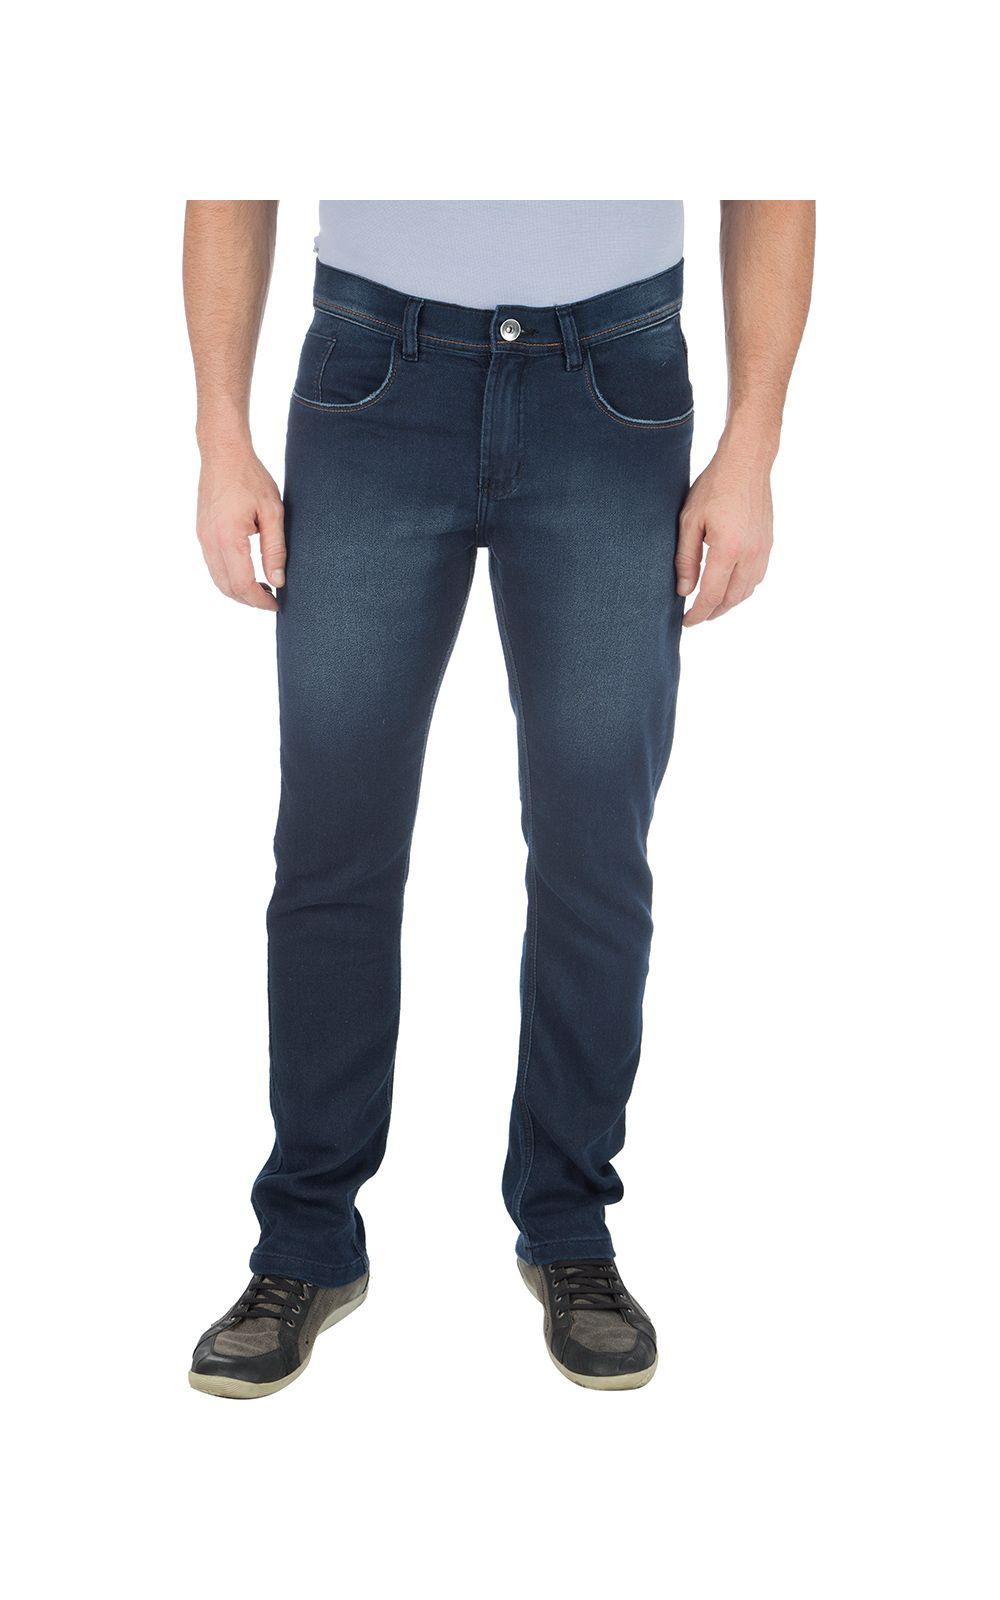 Foto 1 - Calça Jeans Masculina Azul Lisa